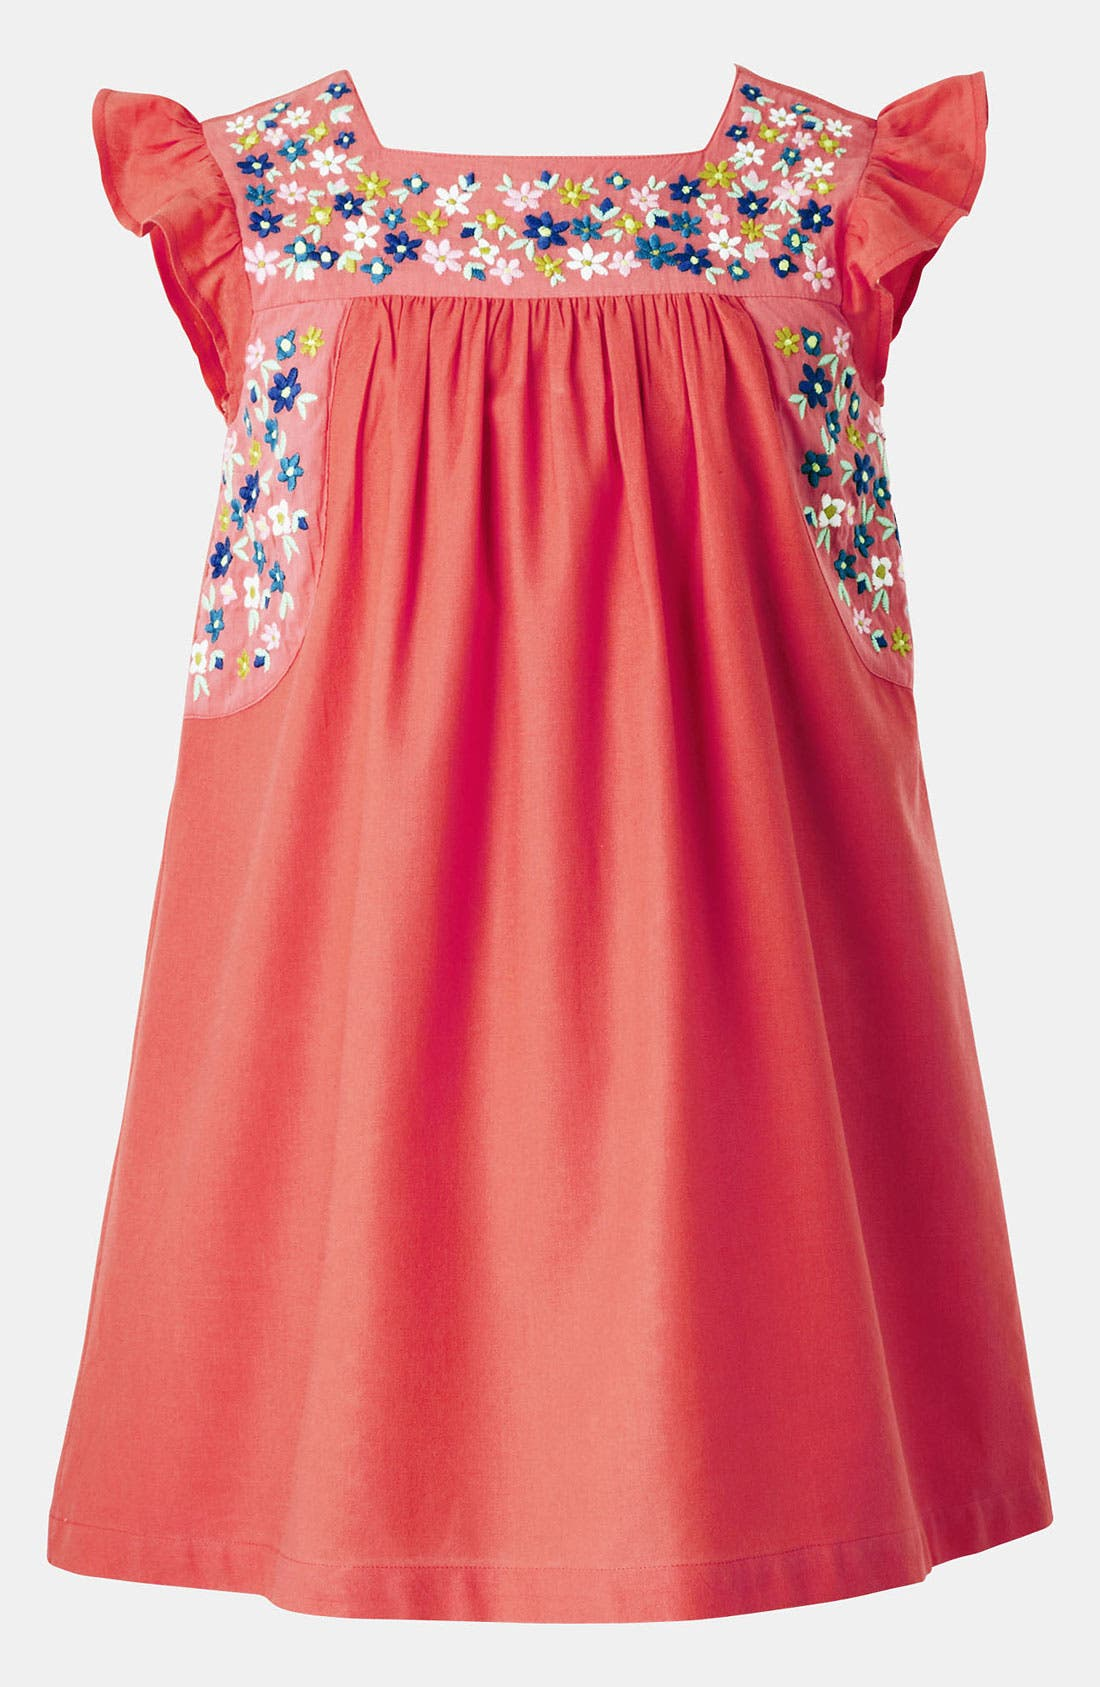 Alternate Image 1 Selected - Mini Boden Embroidered Dress (Big Girls)